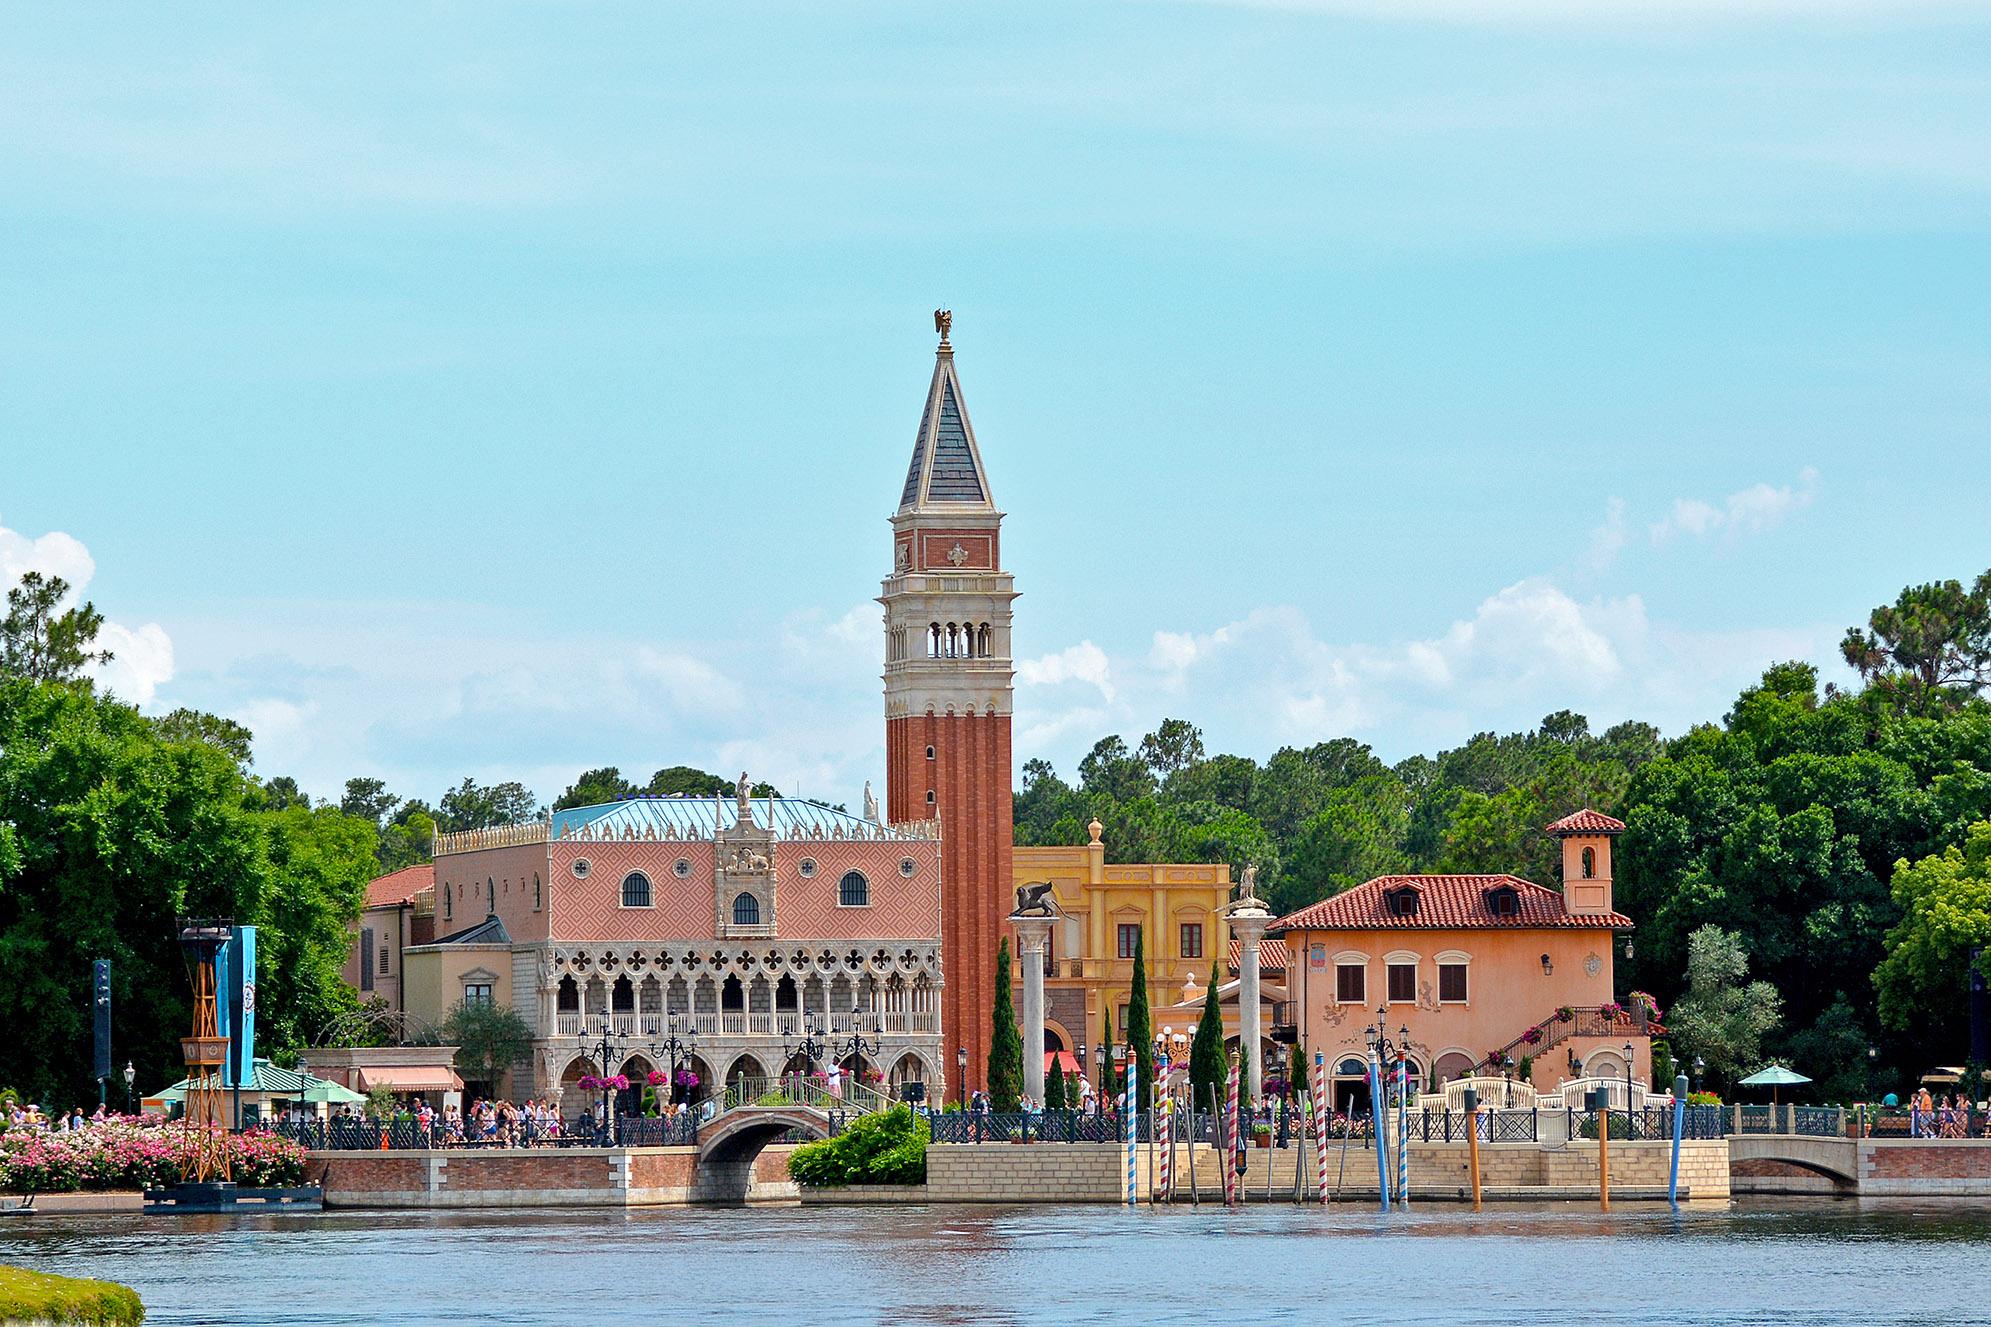 Italien Epcot Walt Disney World i Orlando